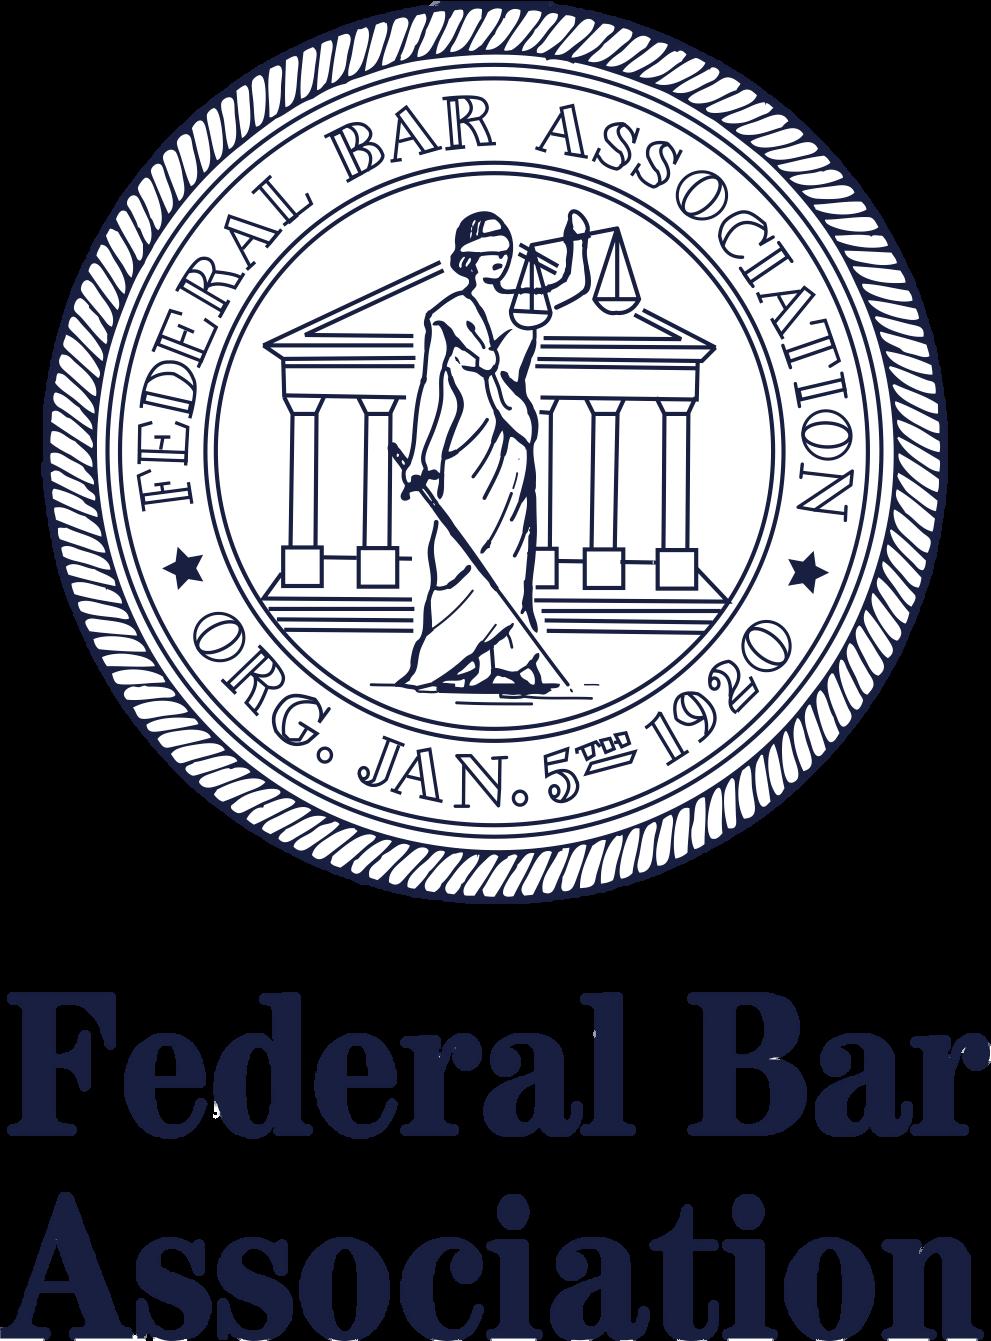 Federal Bar Assoc..png